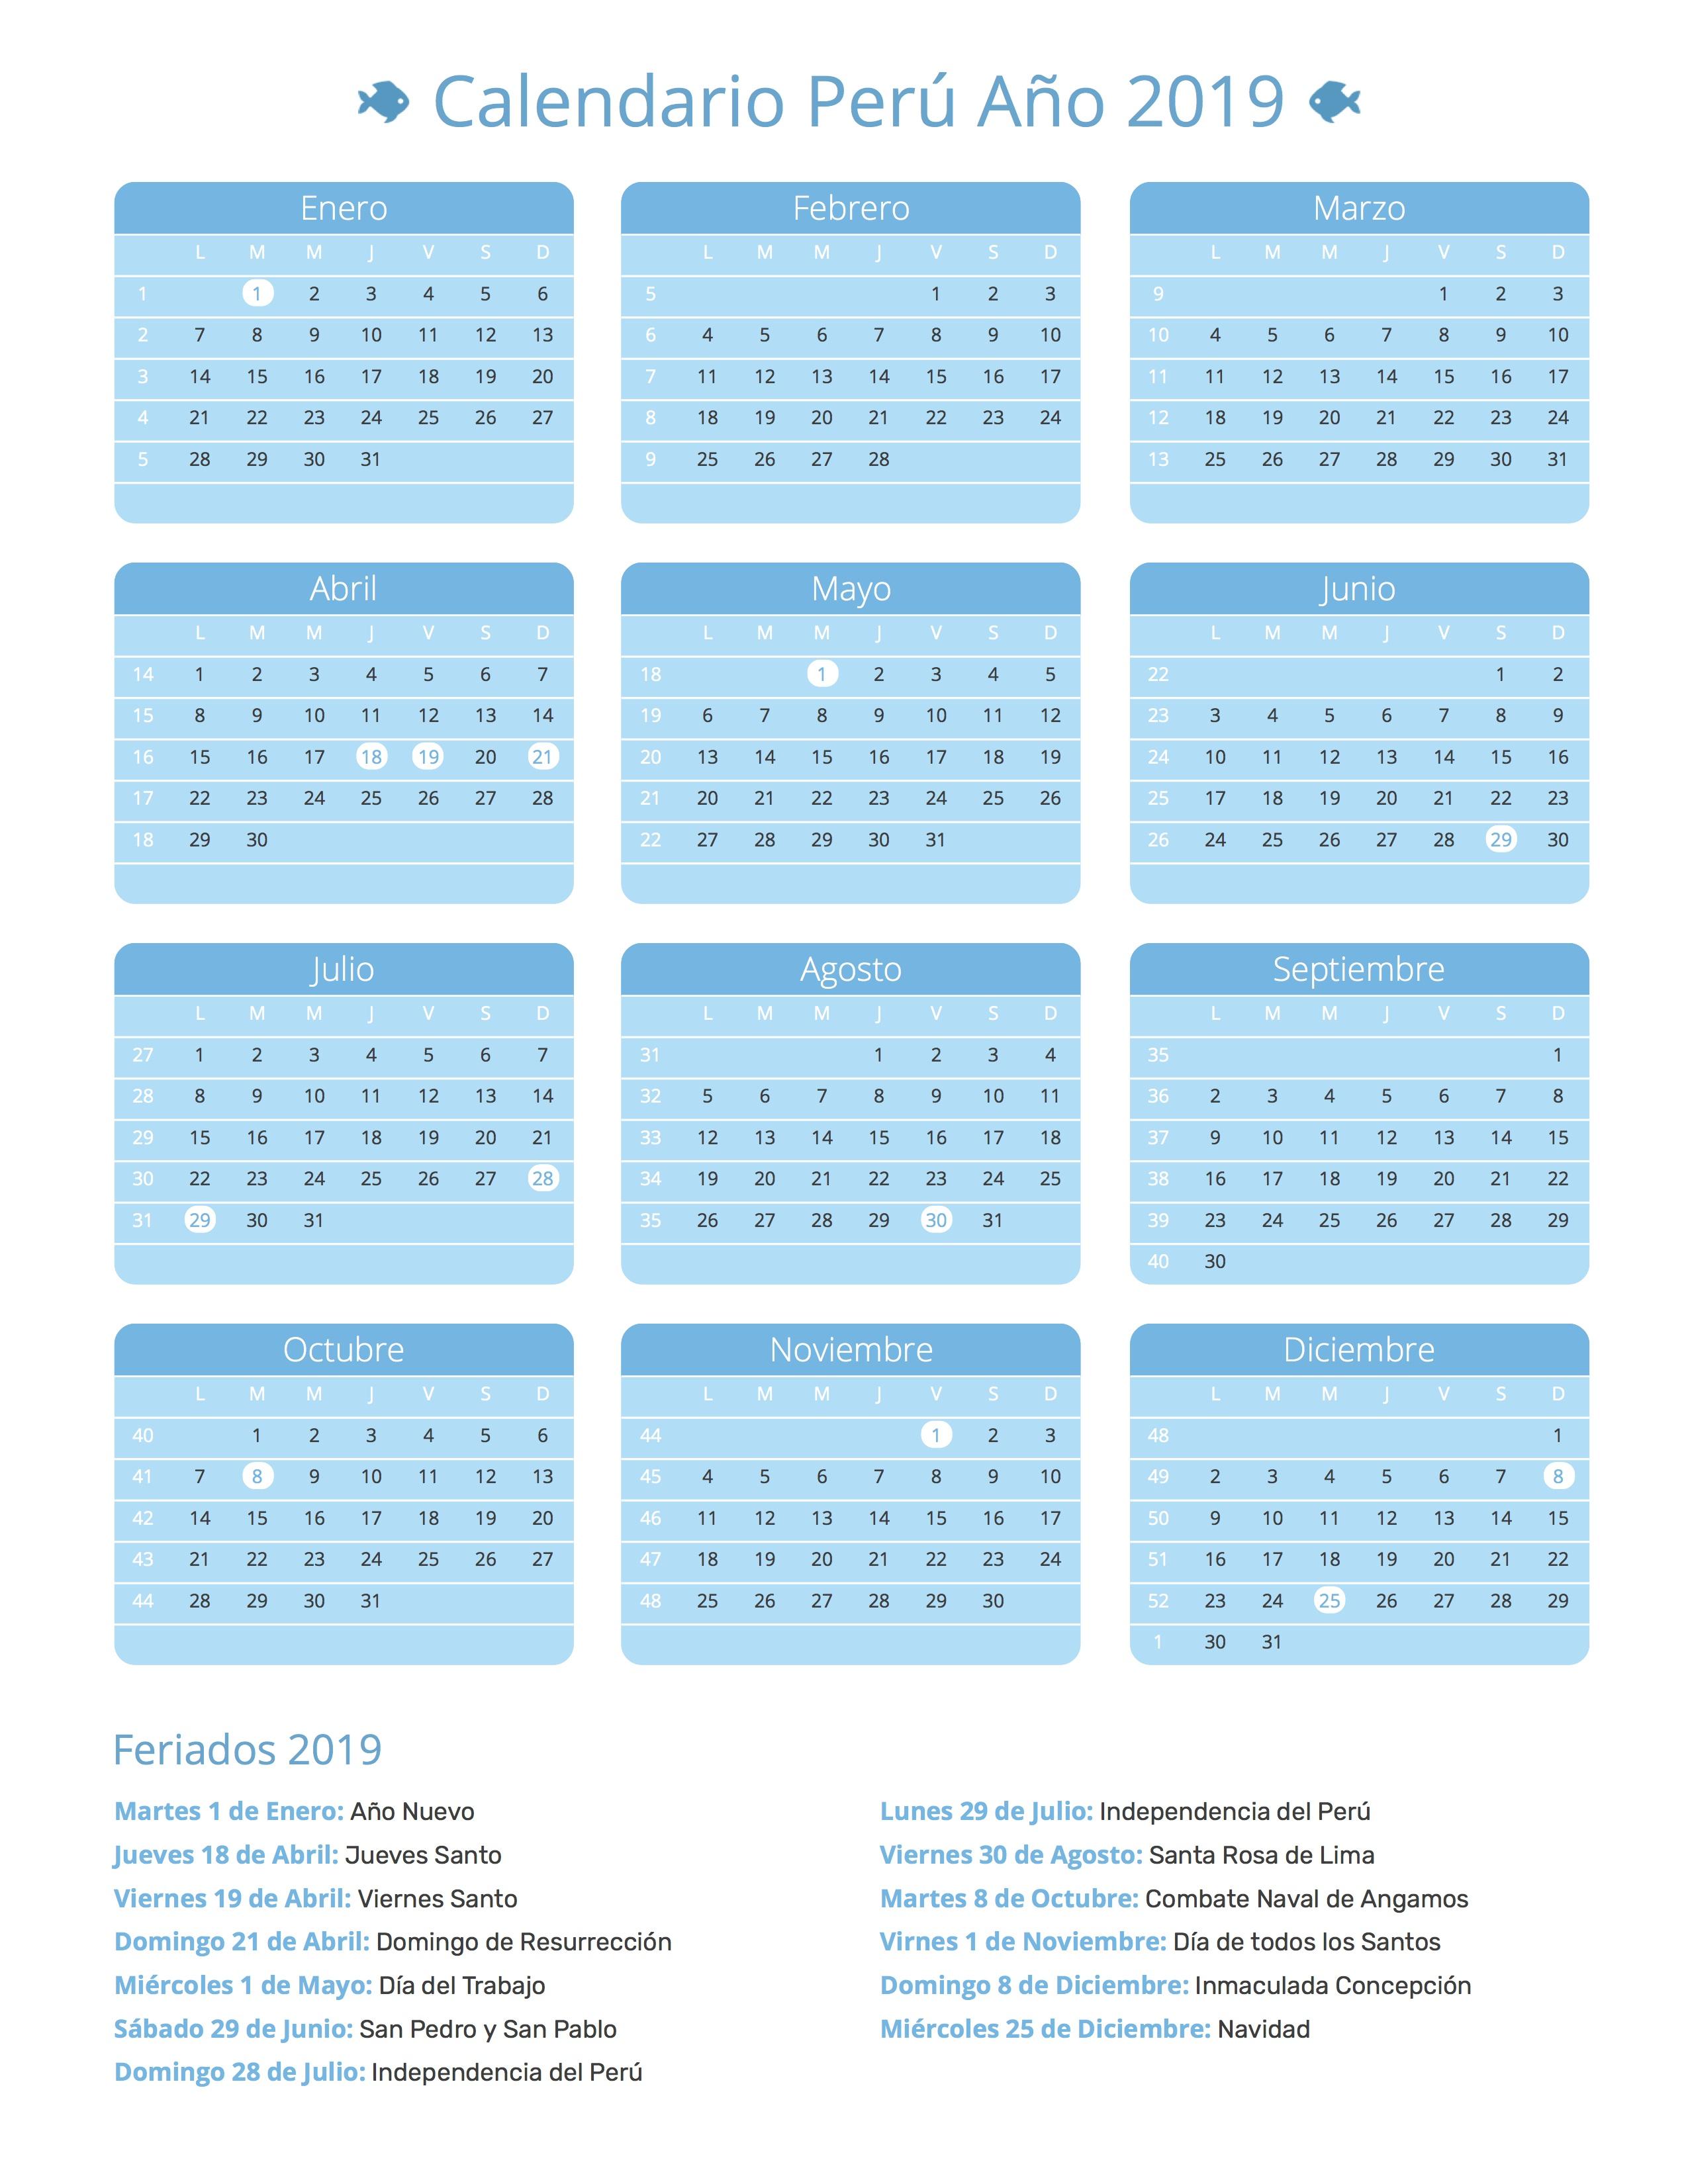 Calendario Marzo 2020 Peru.Calendario De Peru Ano 2019 Feriados